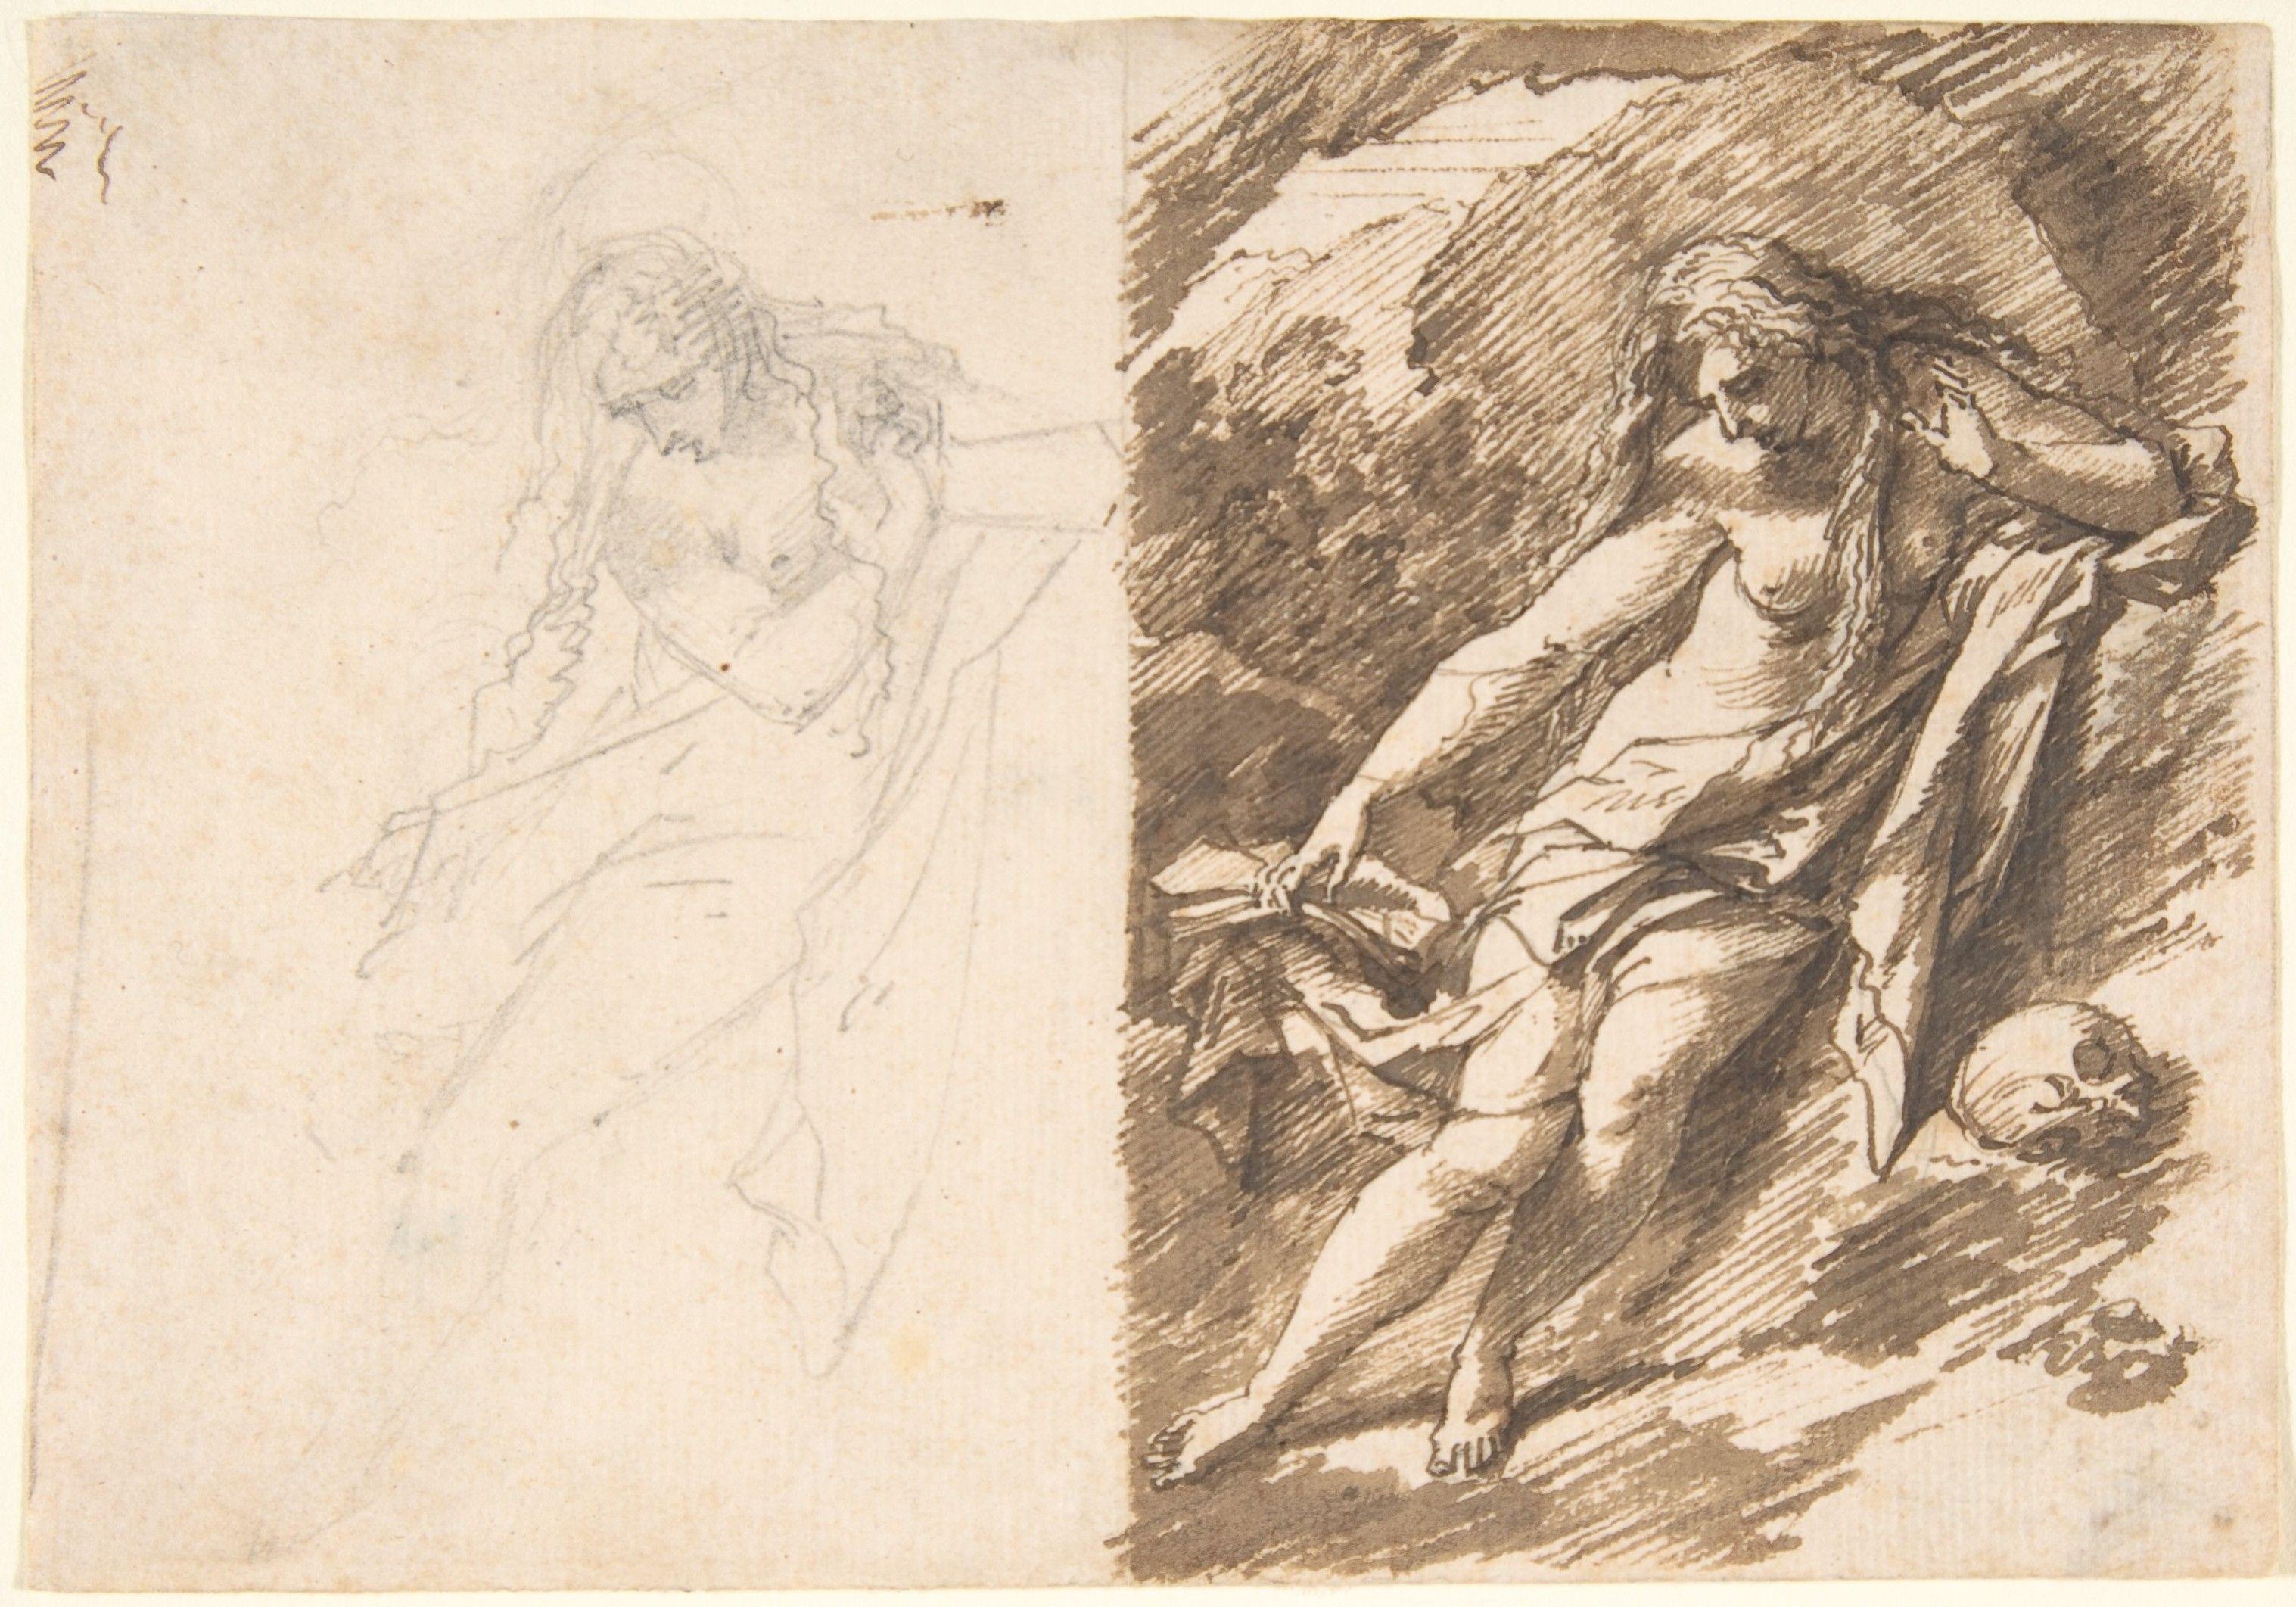 """The Penitent Magdalene"" Artist: Adriaen van der Werff (Dutch, Kralinger-Ambacht 1659–1722 Rotterdam) Date: n.d. Medium: Pen and brown ink Dimensions: sheet: 4 1/2 x 6 5/16 in. (11.5 x 16 cm) Classification: Drawings"